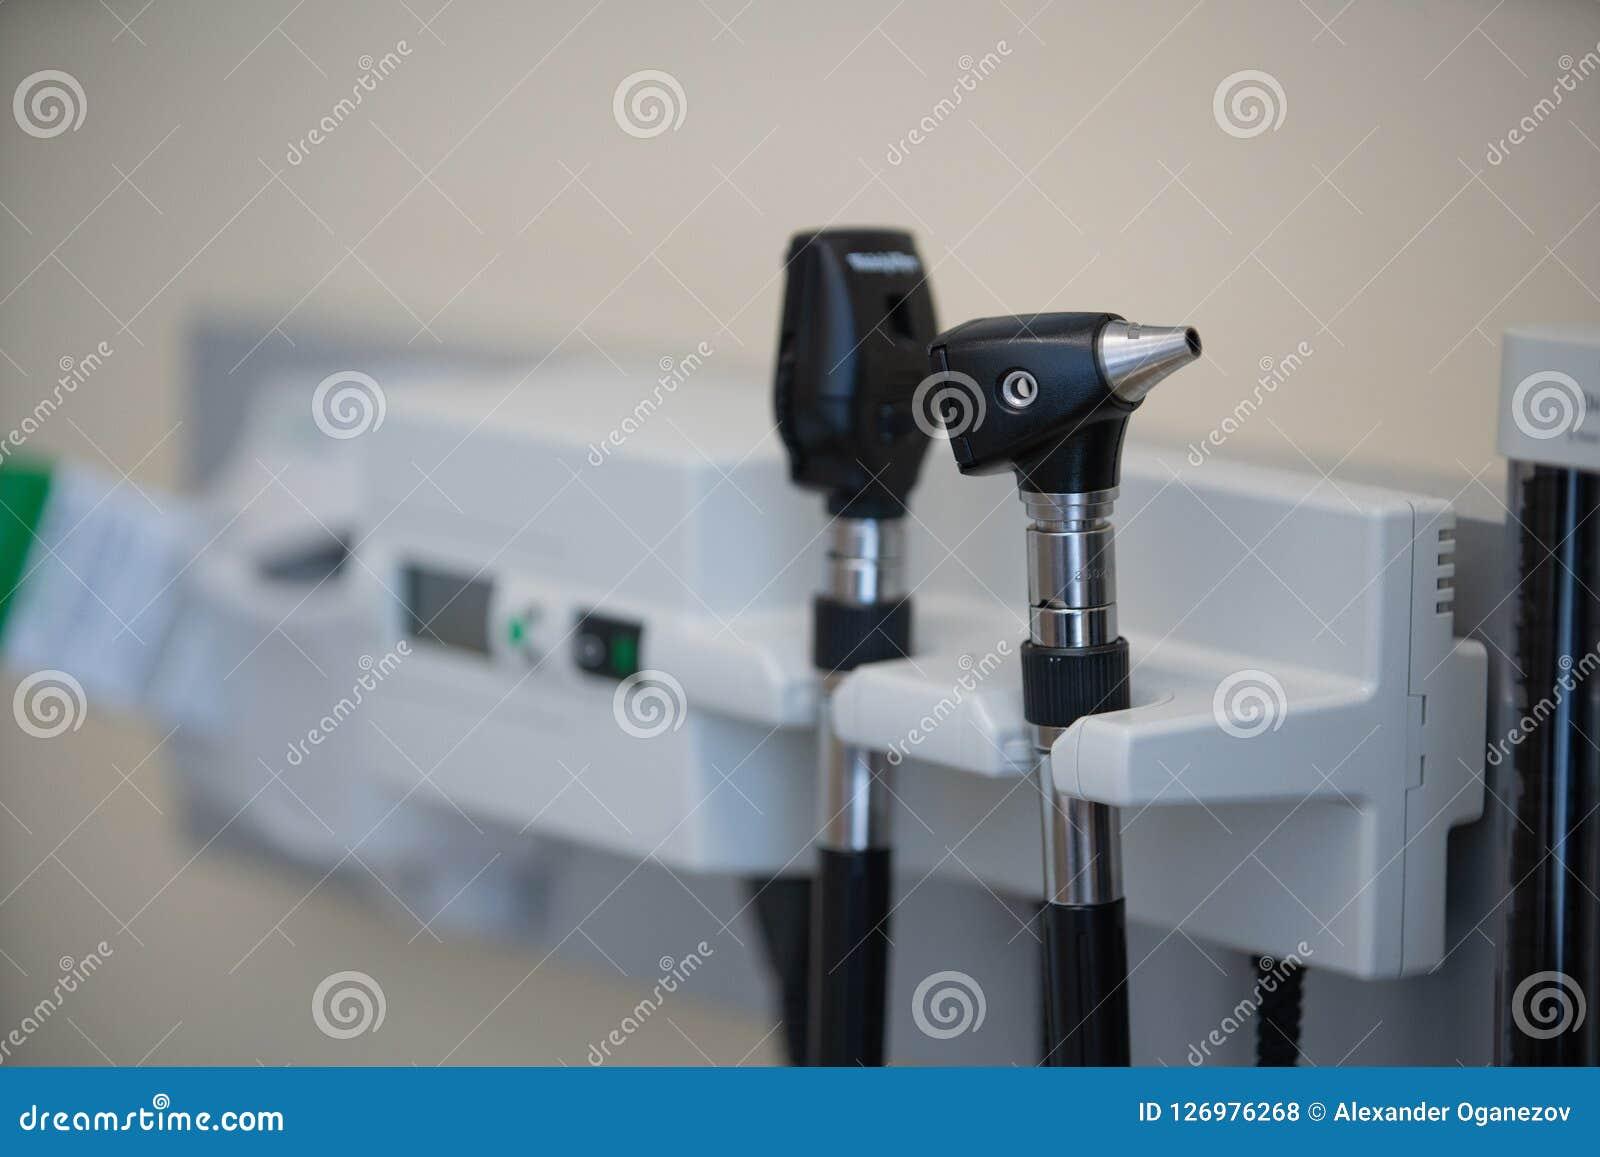 Auriscope d otoscope dans le bureau de docteur